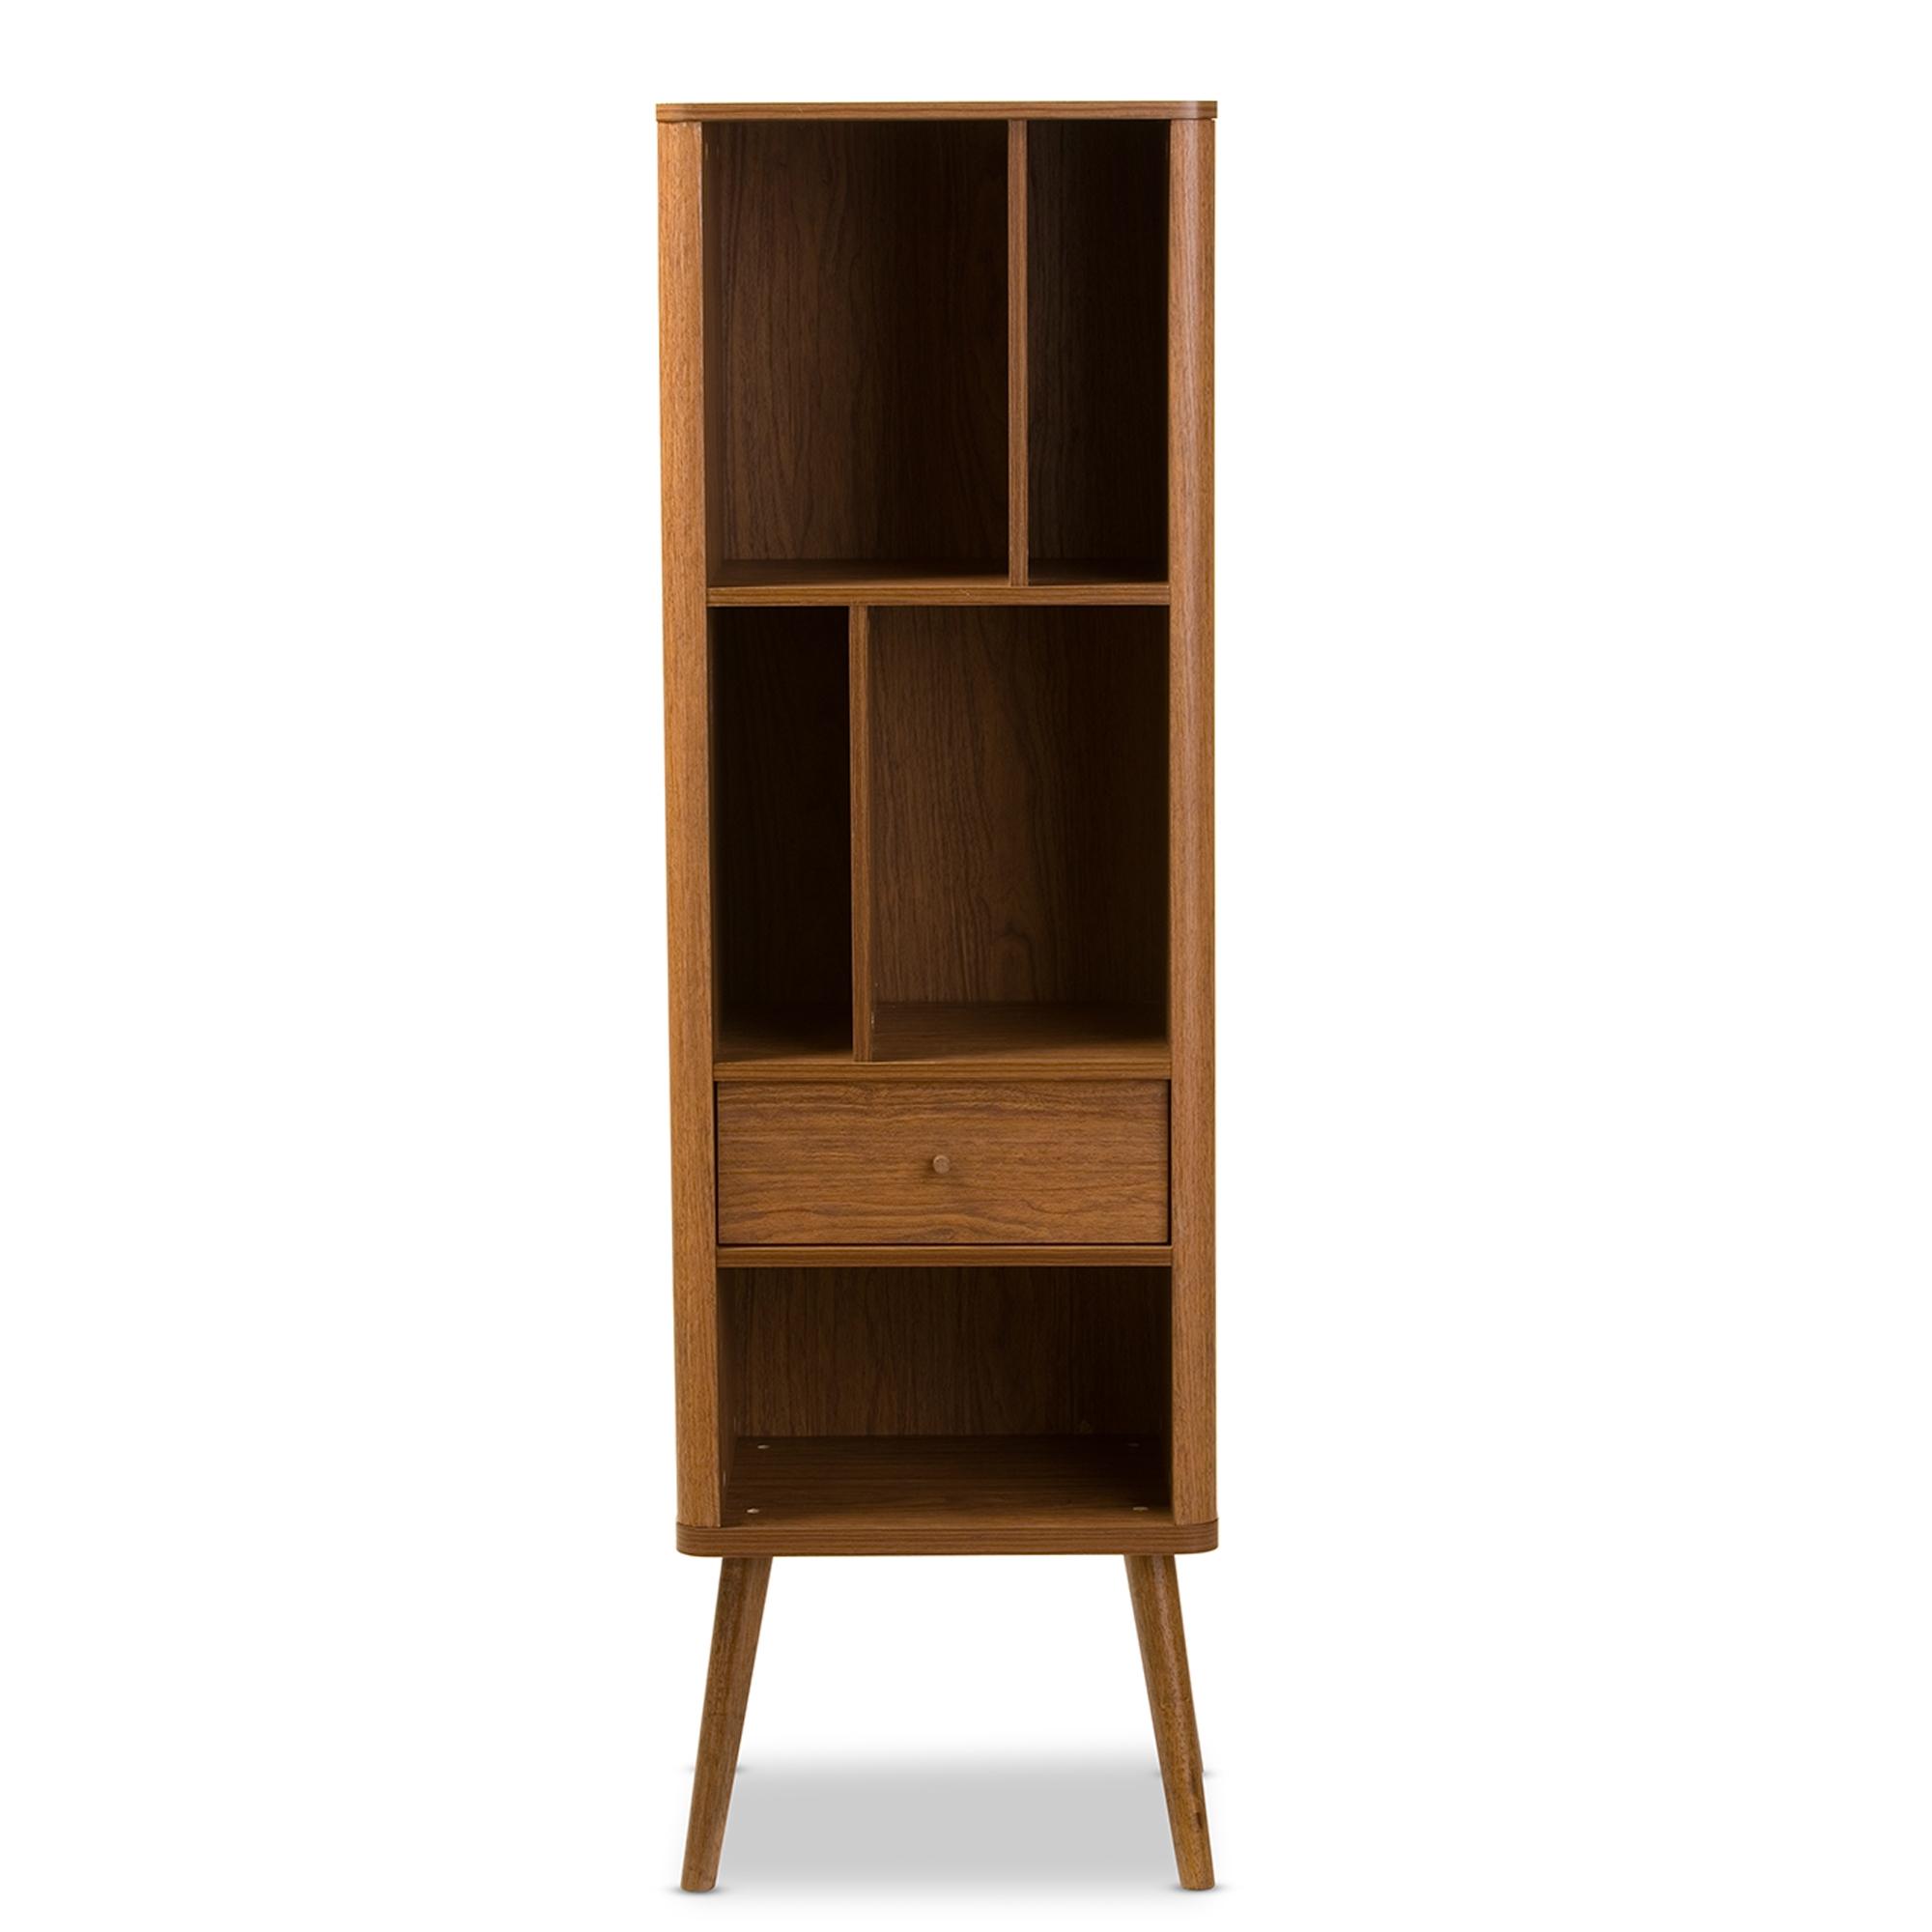 Lovely Baxton Studio Ellingham Mid Century Retro Modern 1 Drawer Sideboard Storage  Cabinet Bookcase Organizer